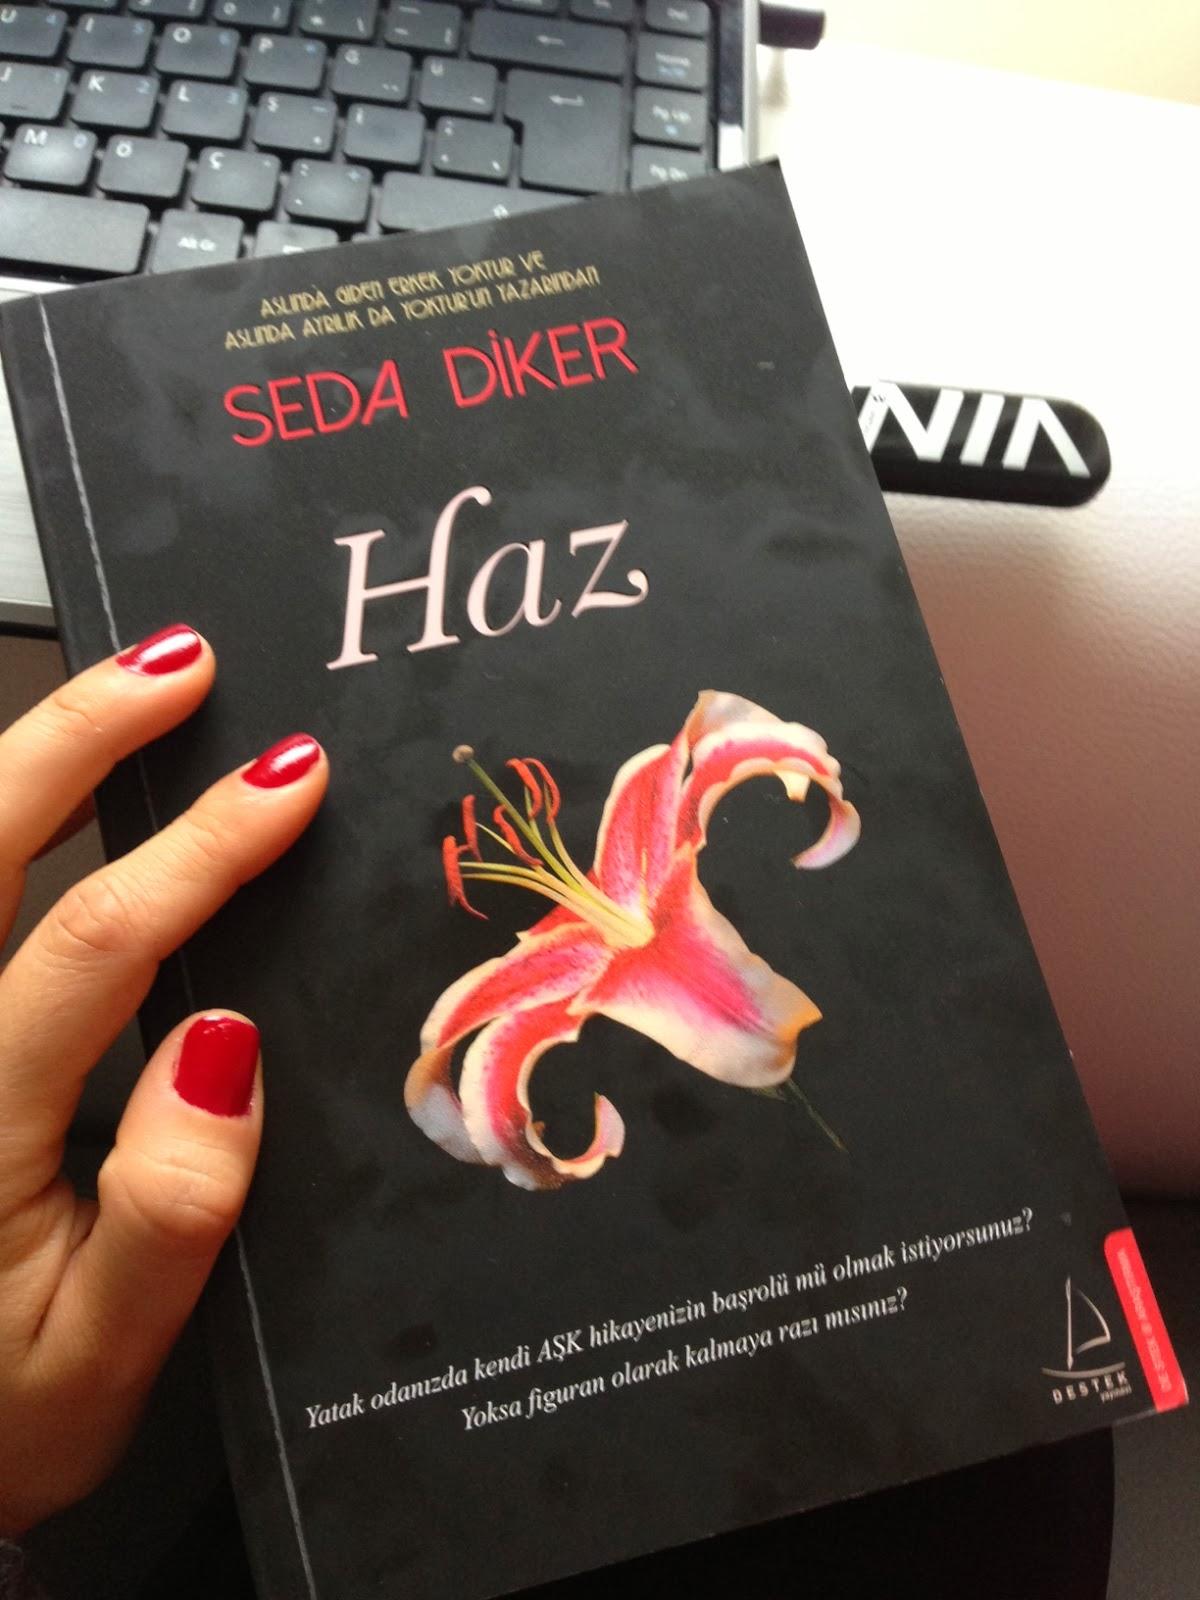 SEDA DIKER HAZ EPUB DOWNLOAD